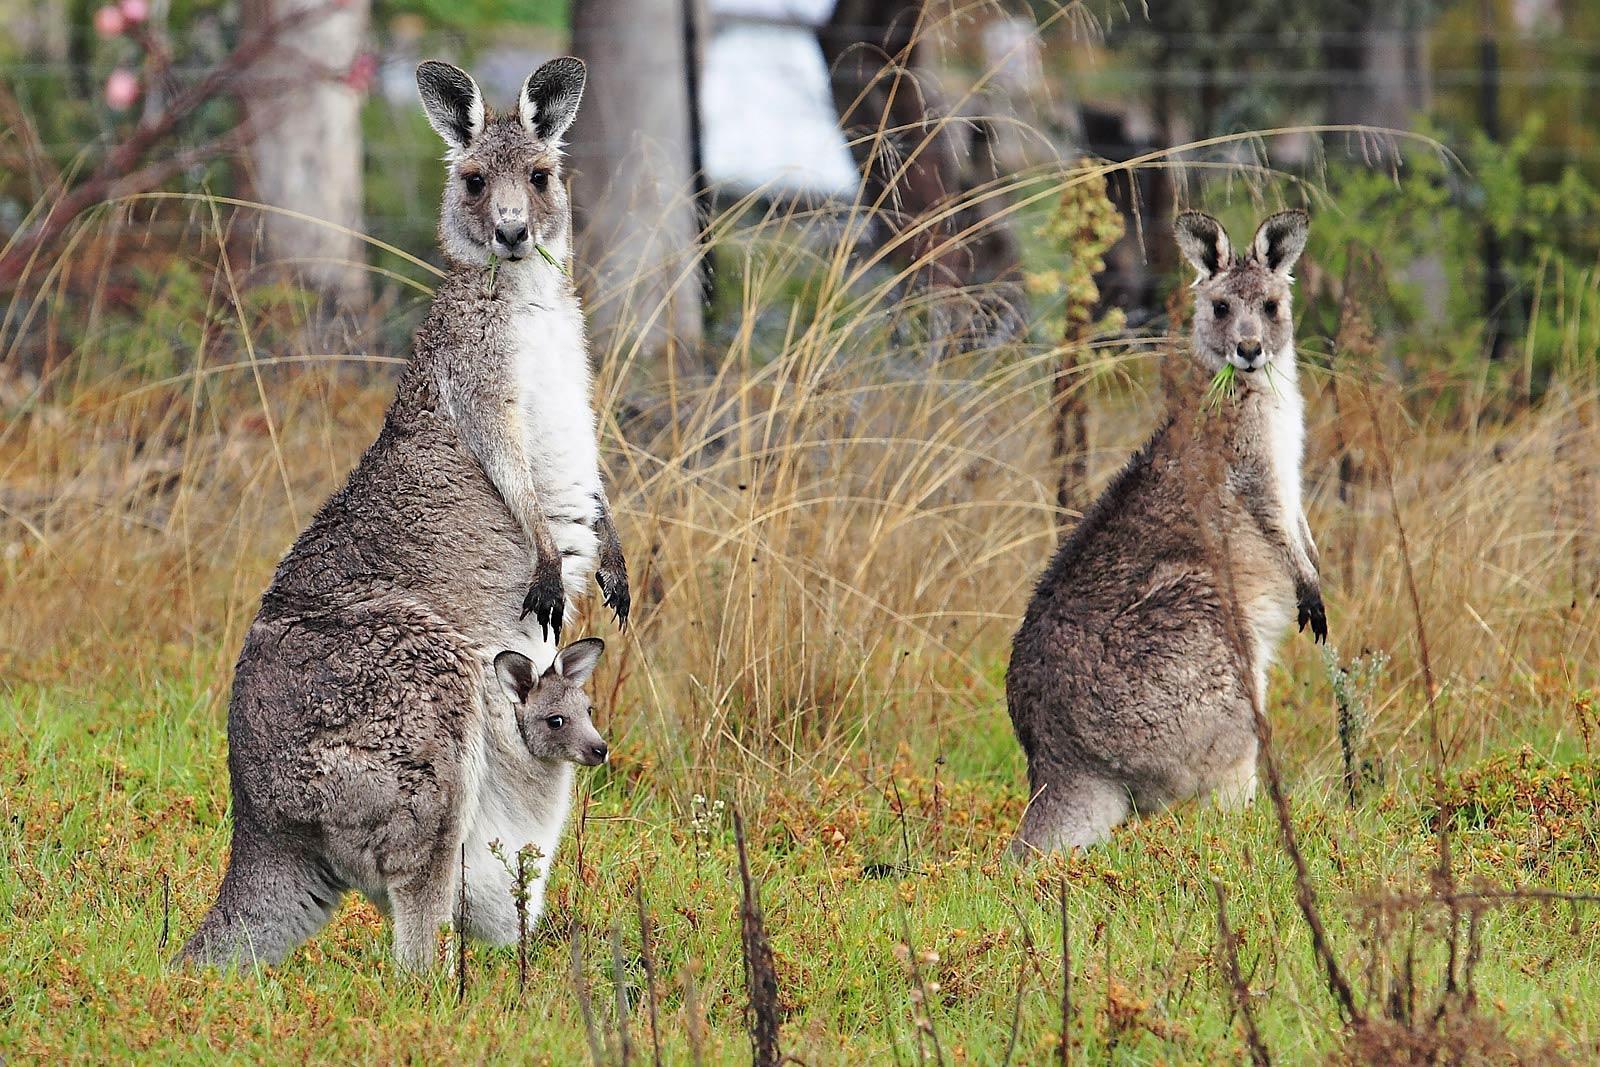 kangaroo wallpaper - Animal Backgrounds